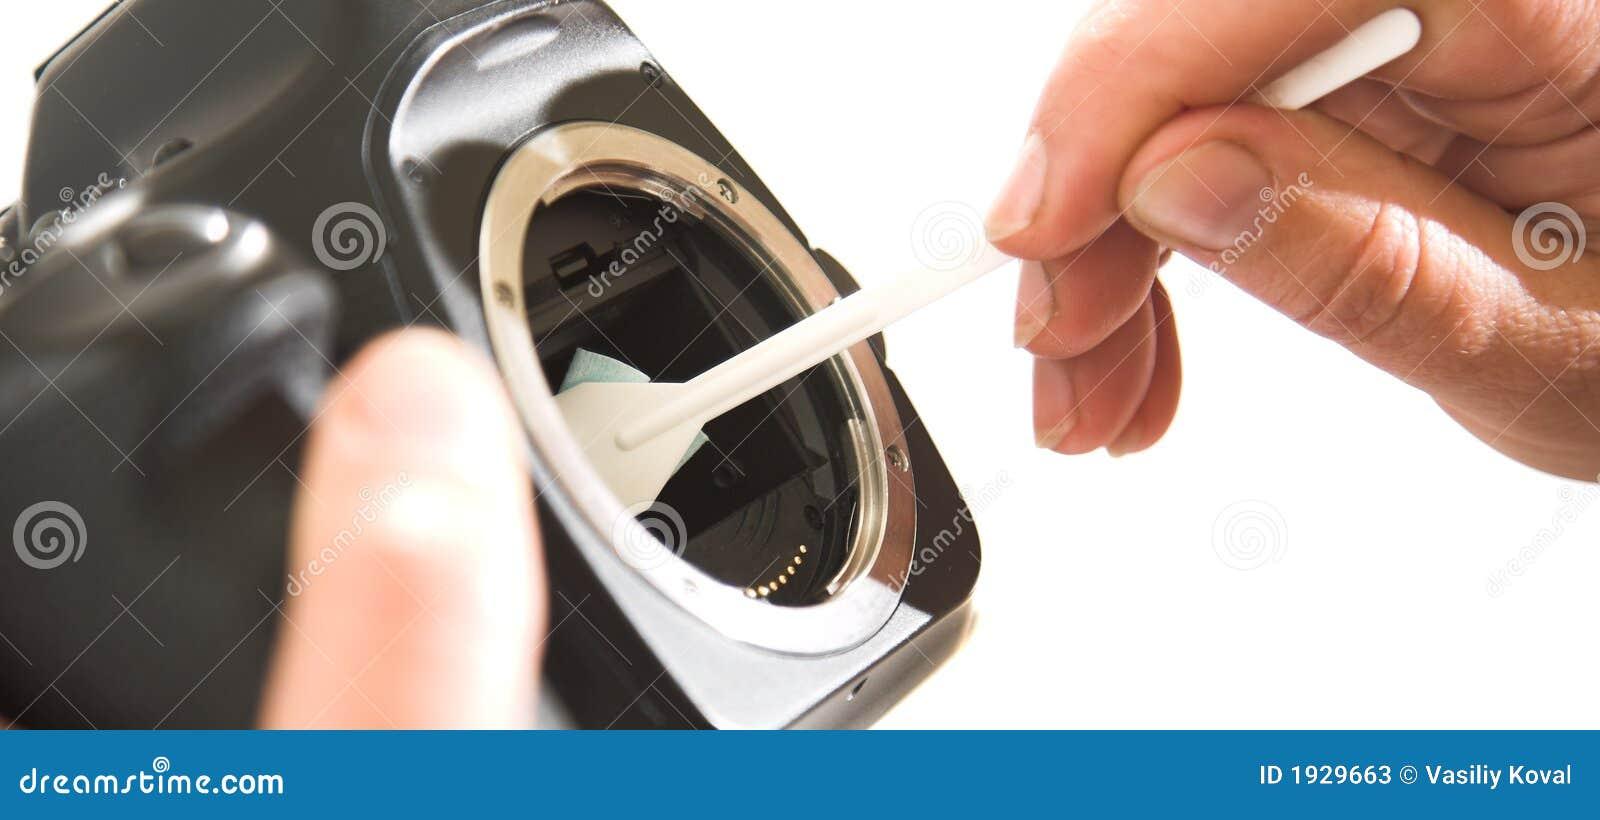 Sensor cleanilig